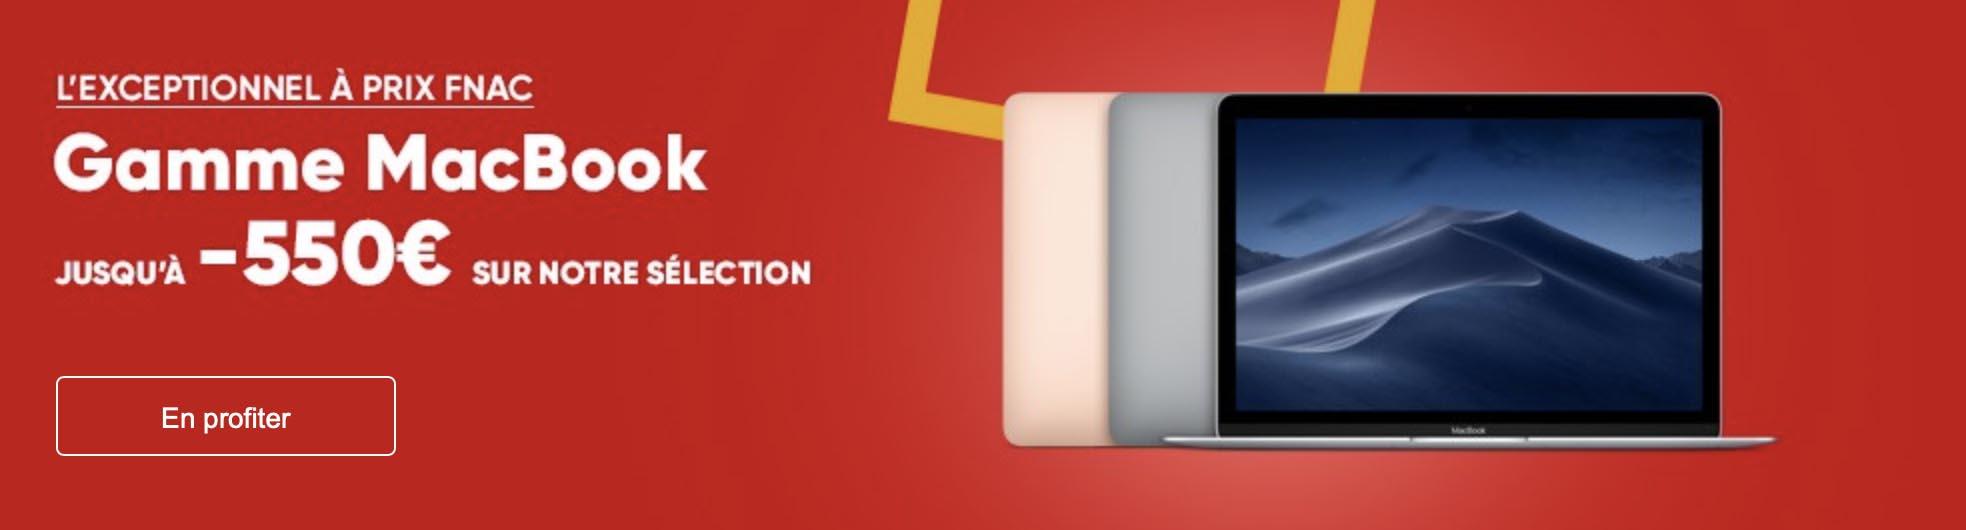 Promo Fnac MacBook